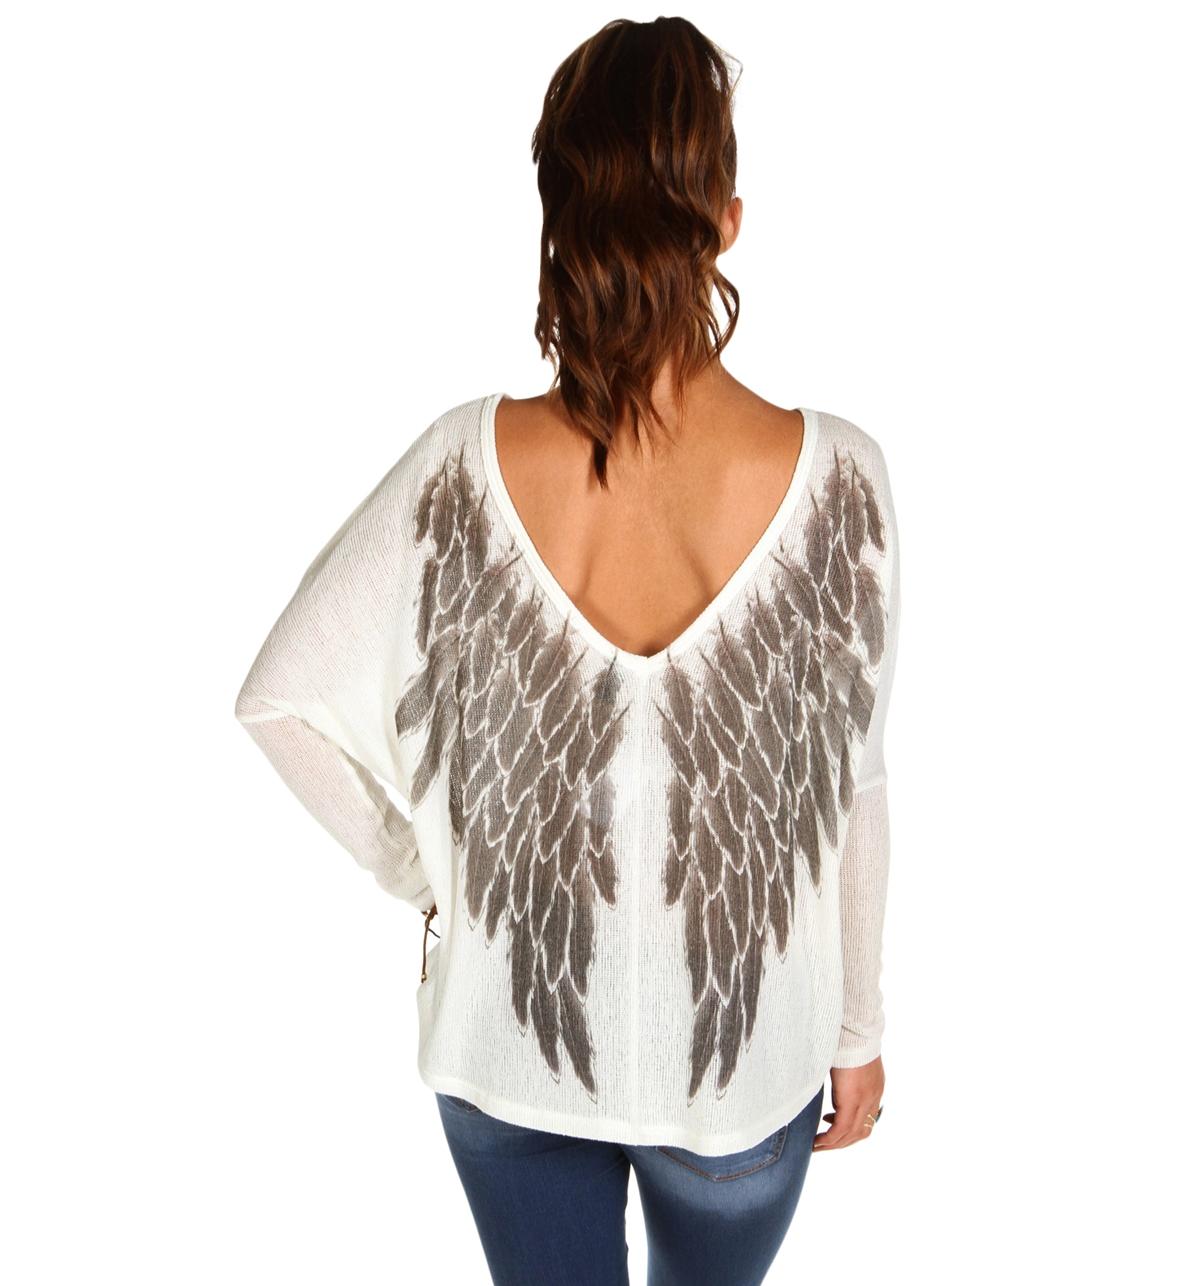 Ivory Angel Wings Back Dolman Top